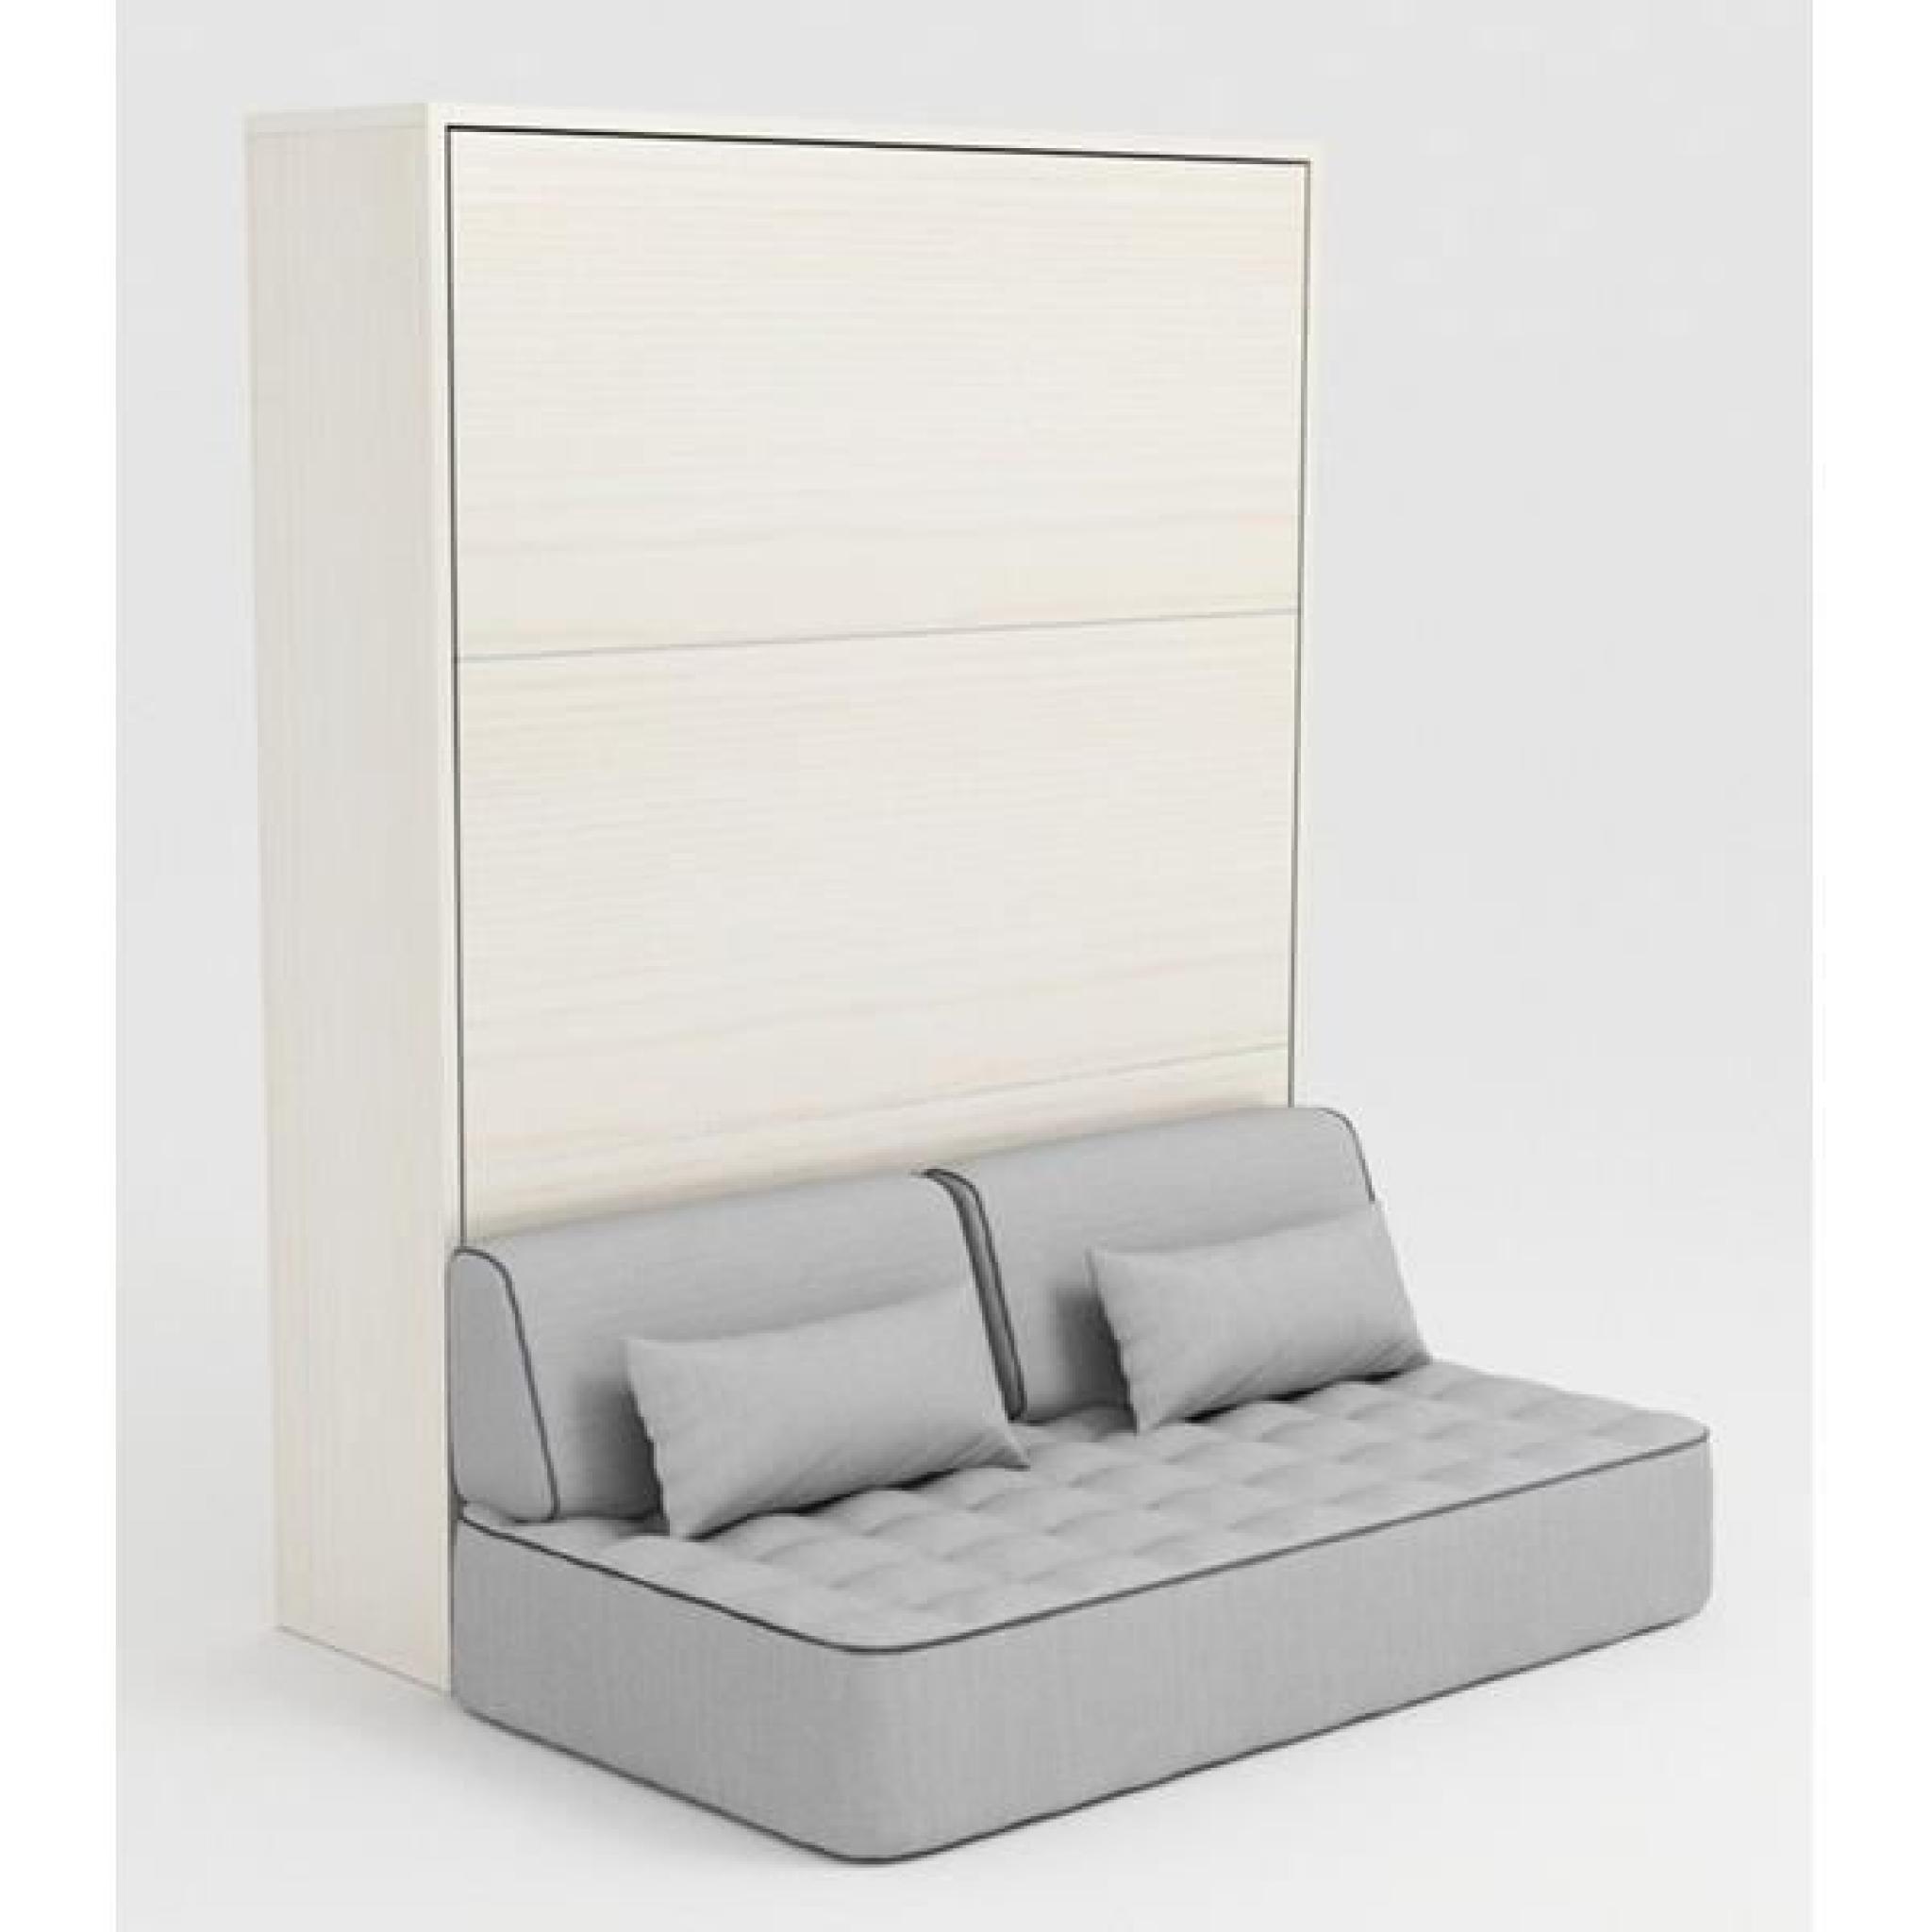 armoire lit escamotable stone 160x200 blanc canape